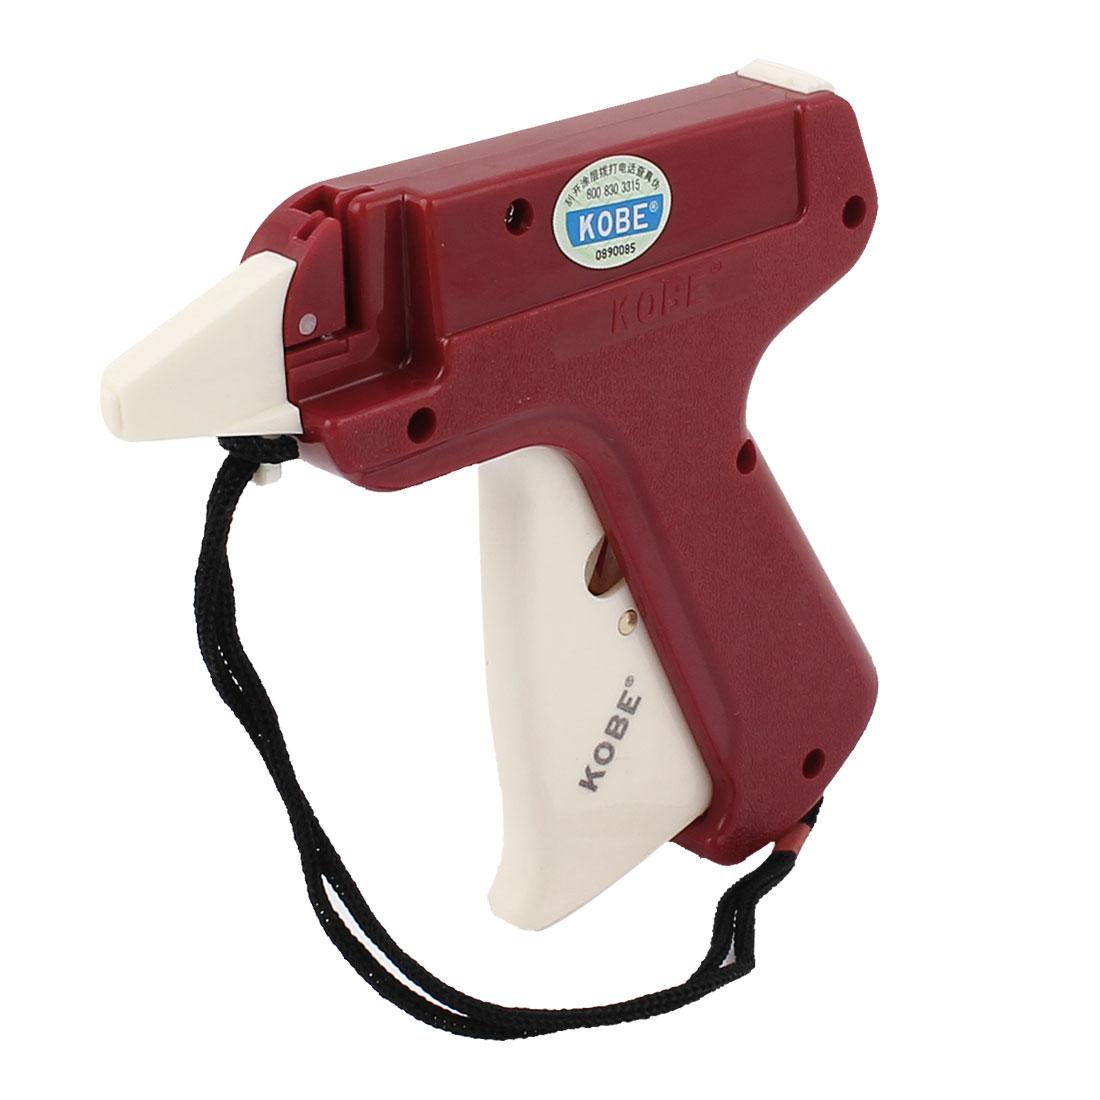 White Red Plastic Garment Price Labelling KOBE Tagging Gun w Lifting Rope